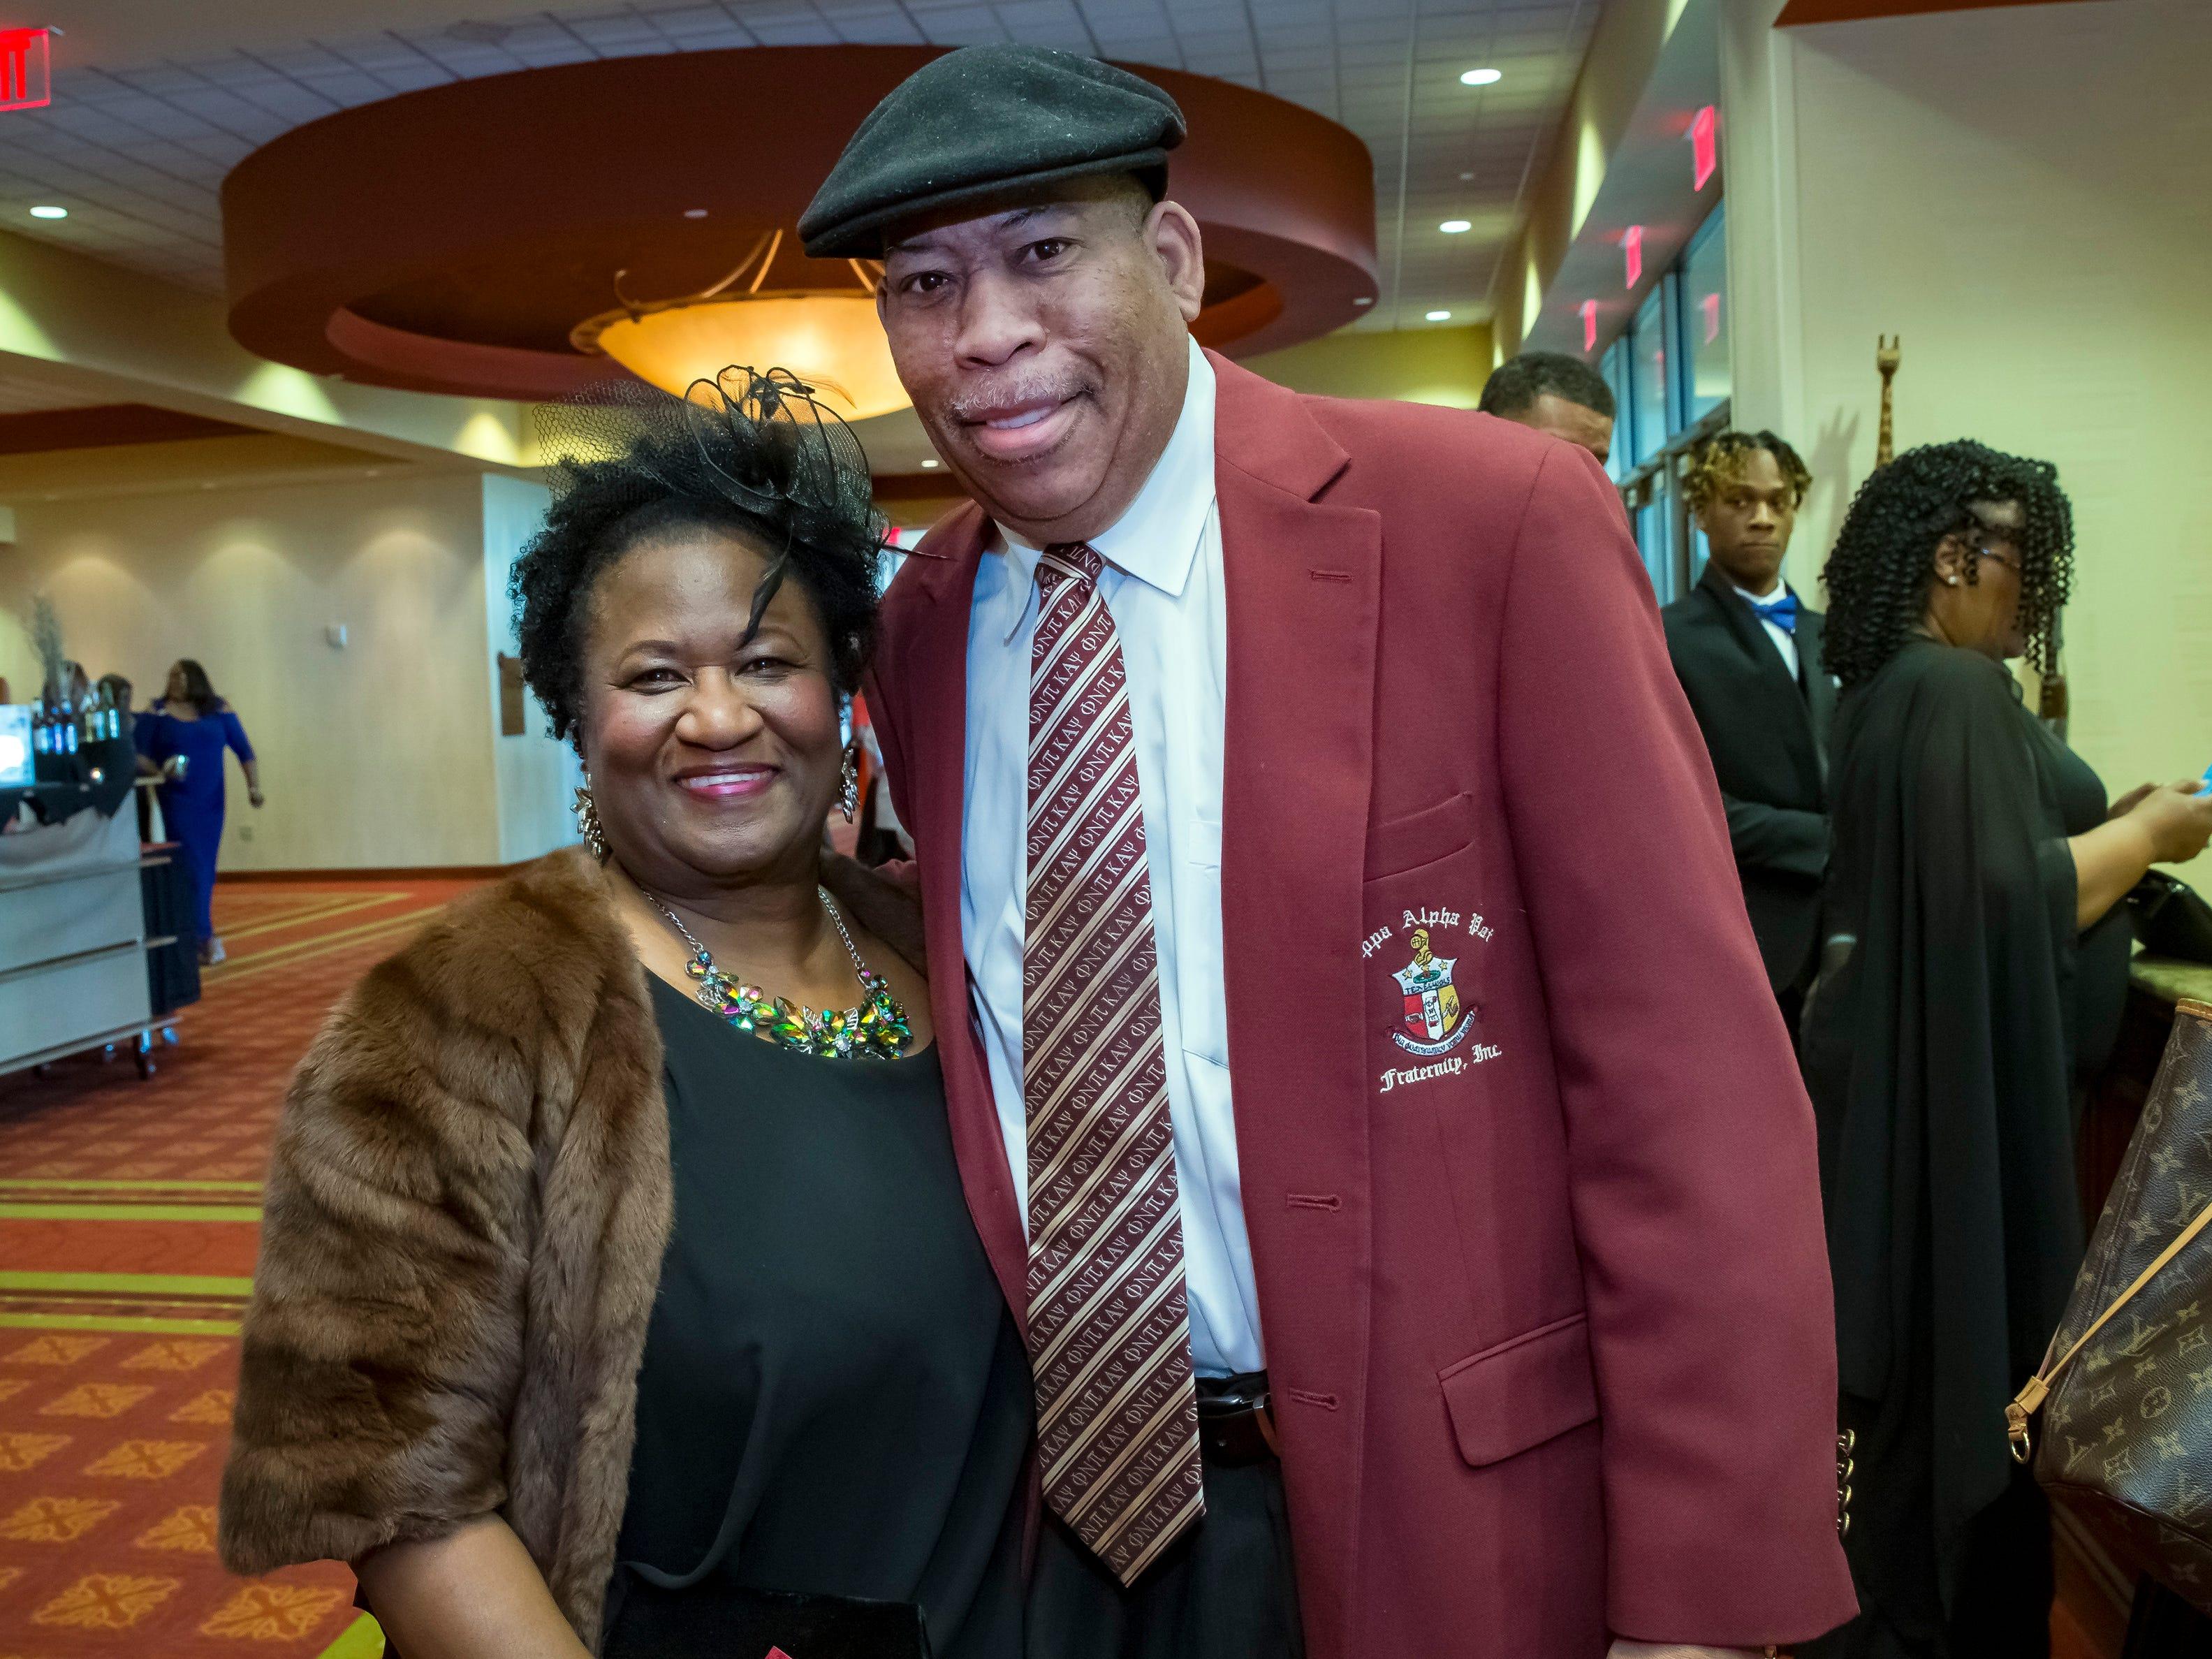 Phyllis and Ron Washington at the Murfreesboro Alumni Chapter of Kappa Alpha Psi Fraternity Beautillion held at Embassy Suites.